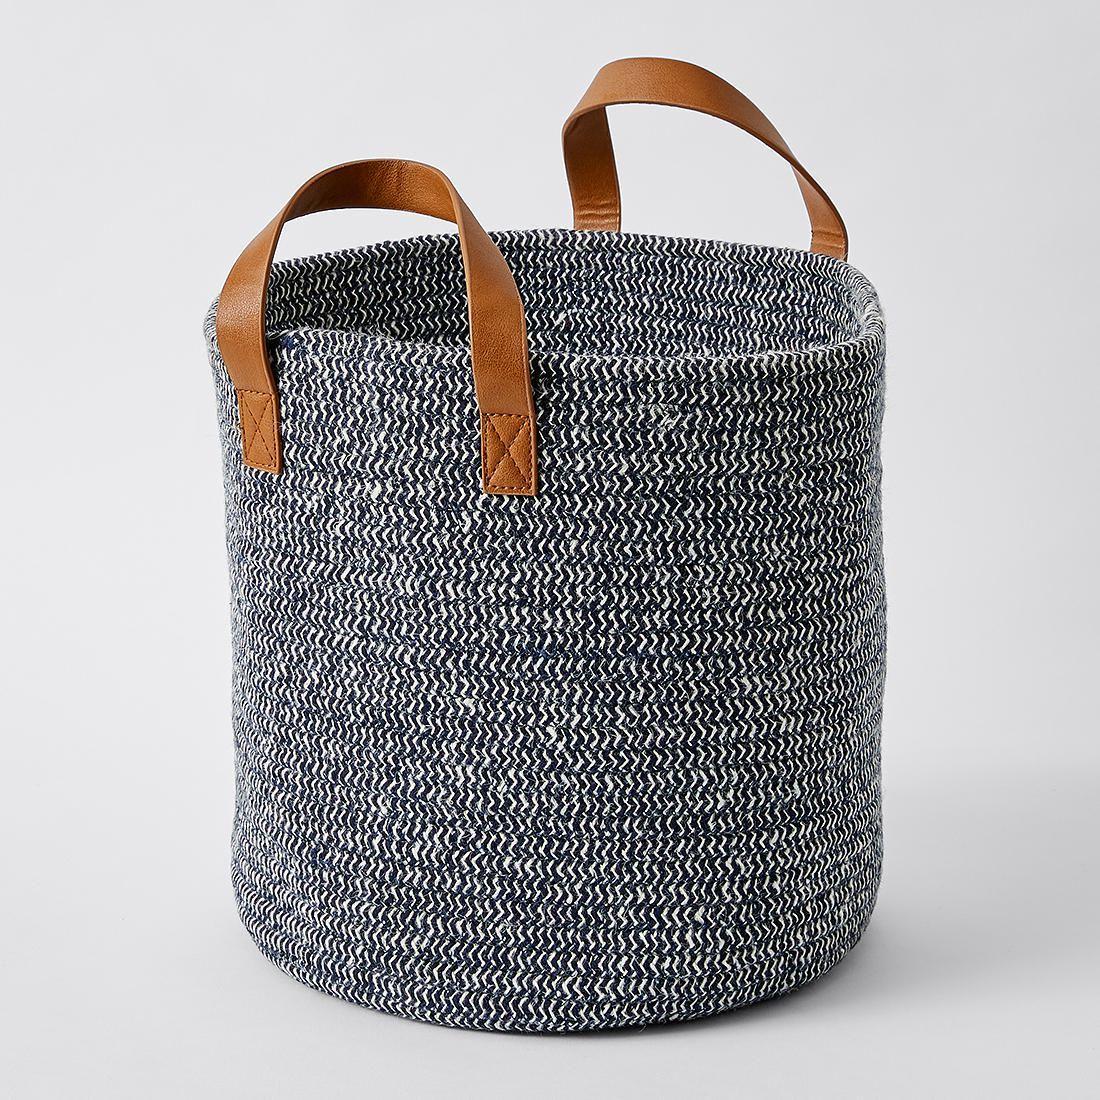 Woven jute basket jute laundry and storage woven jute basket target australia gumiabroncs Gallery